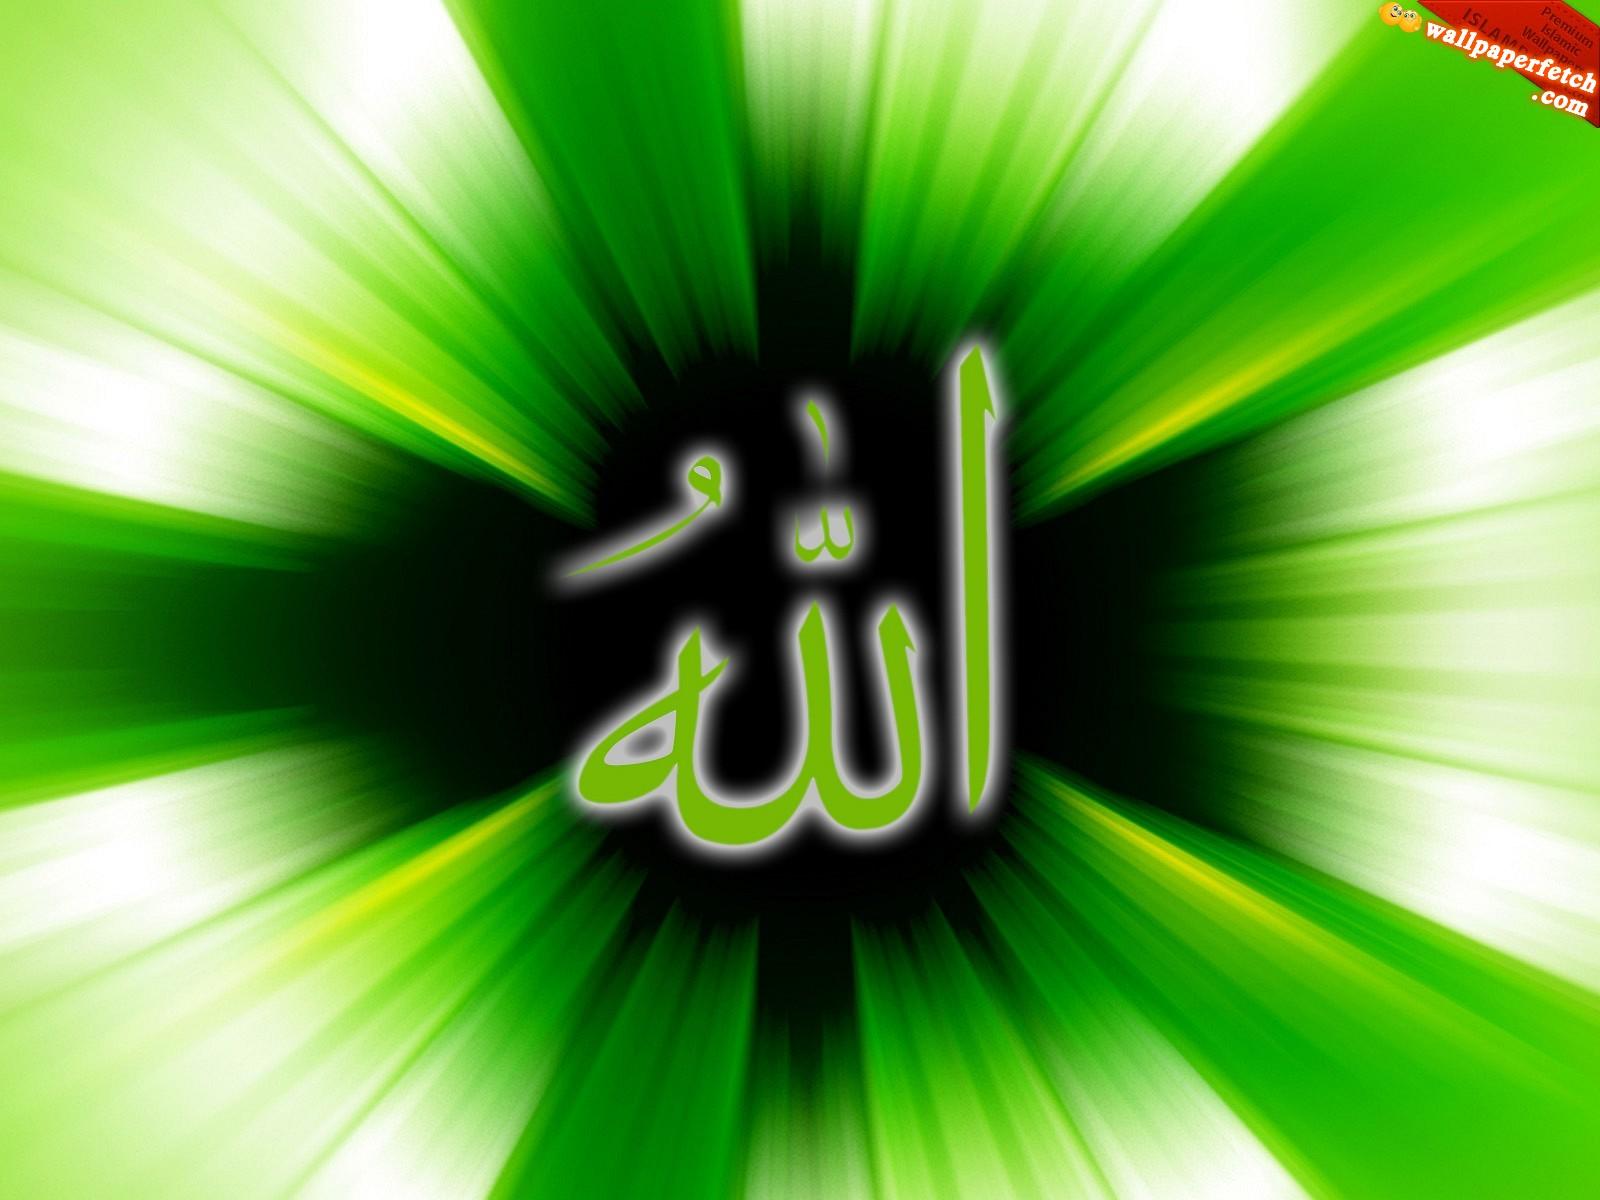 http://1.bp.blogspot.com/-LTpIplH3pI4/T8pnuIxARnI/AAAAAAAAPSw/h3hfg7osZlA/s1600/green-eternity-allah-wallpapers.JPG